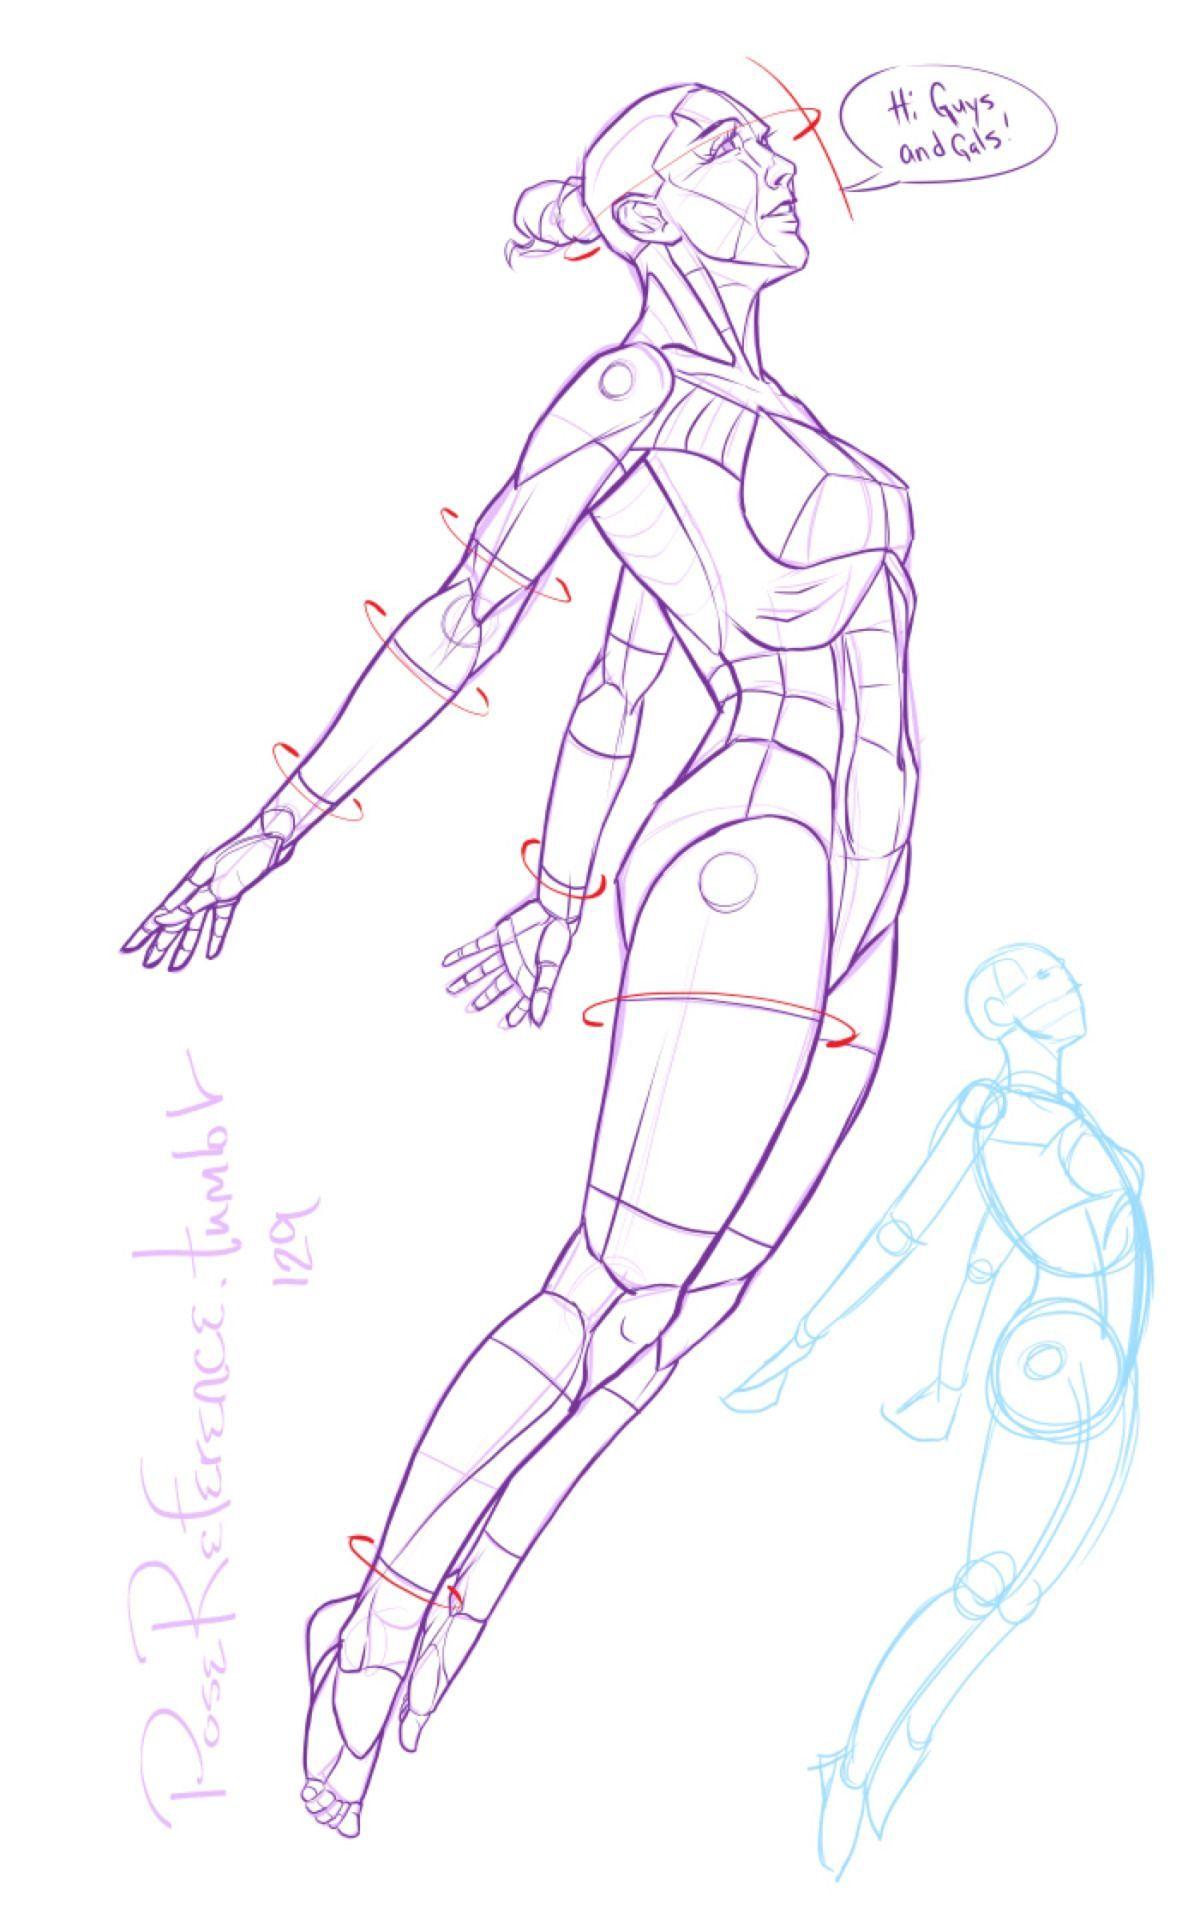 Anatoref Pose References By Justin Martin Kickstarter Figure Drawing Poses Human Anatomy Drawing Human Figure Drawing Male body reference anatomy 360. figure drawing poses